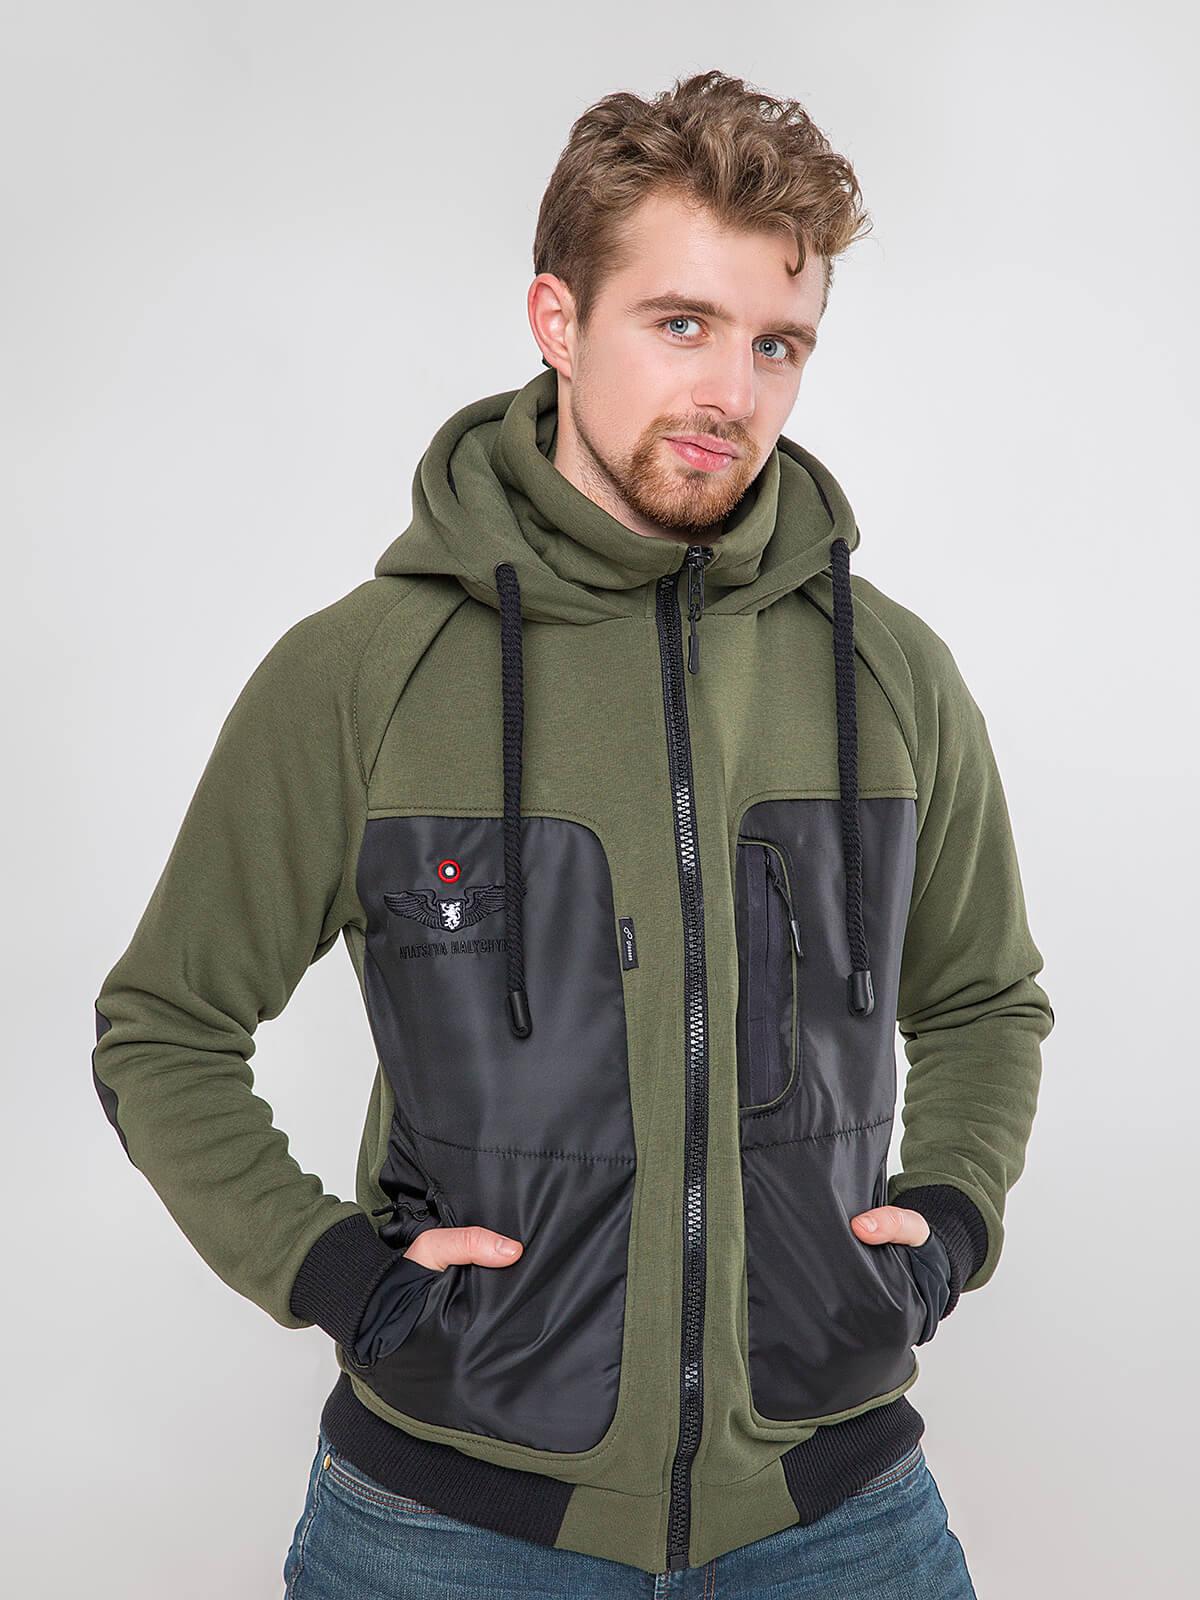 Men's Hoodie Syla. Color khaki. Unisex hoodie (men's sizes).